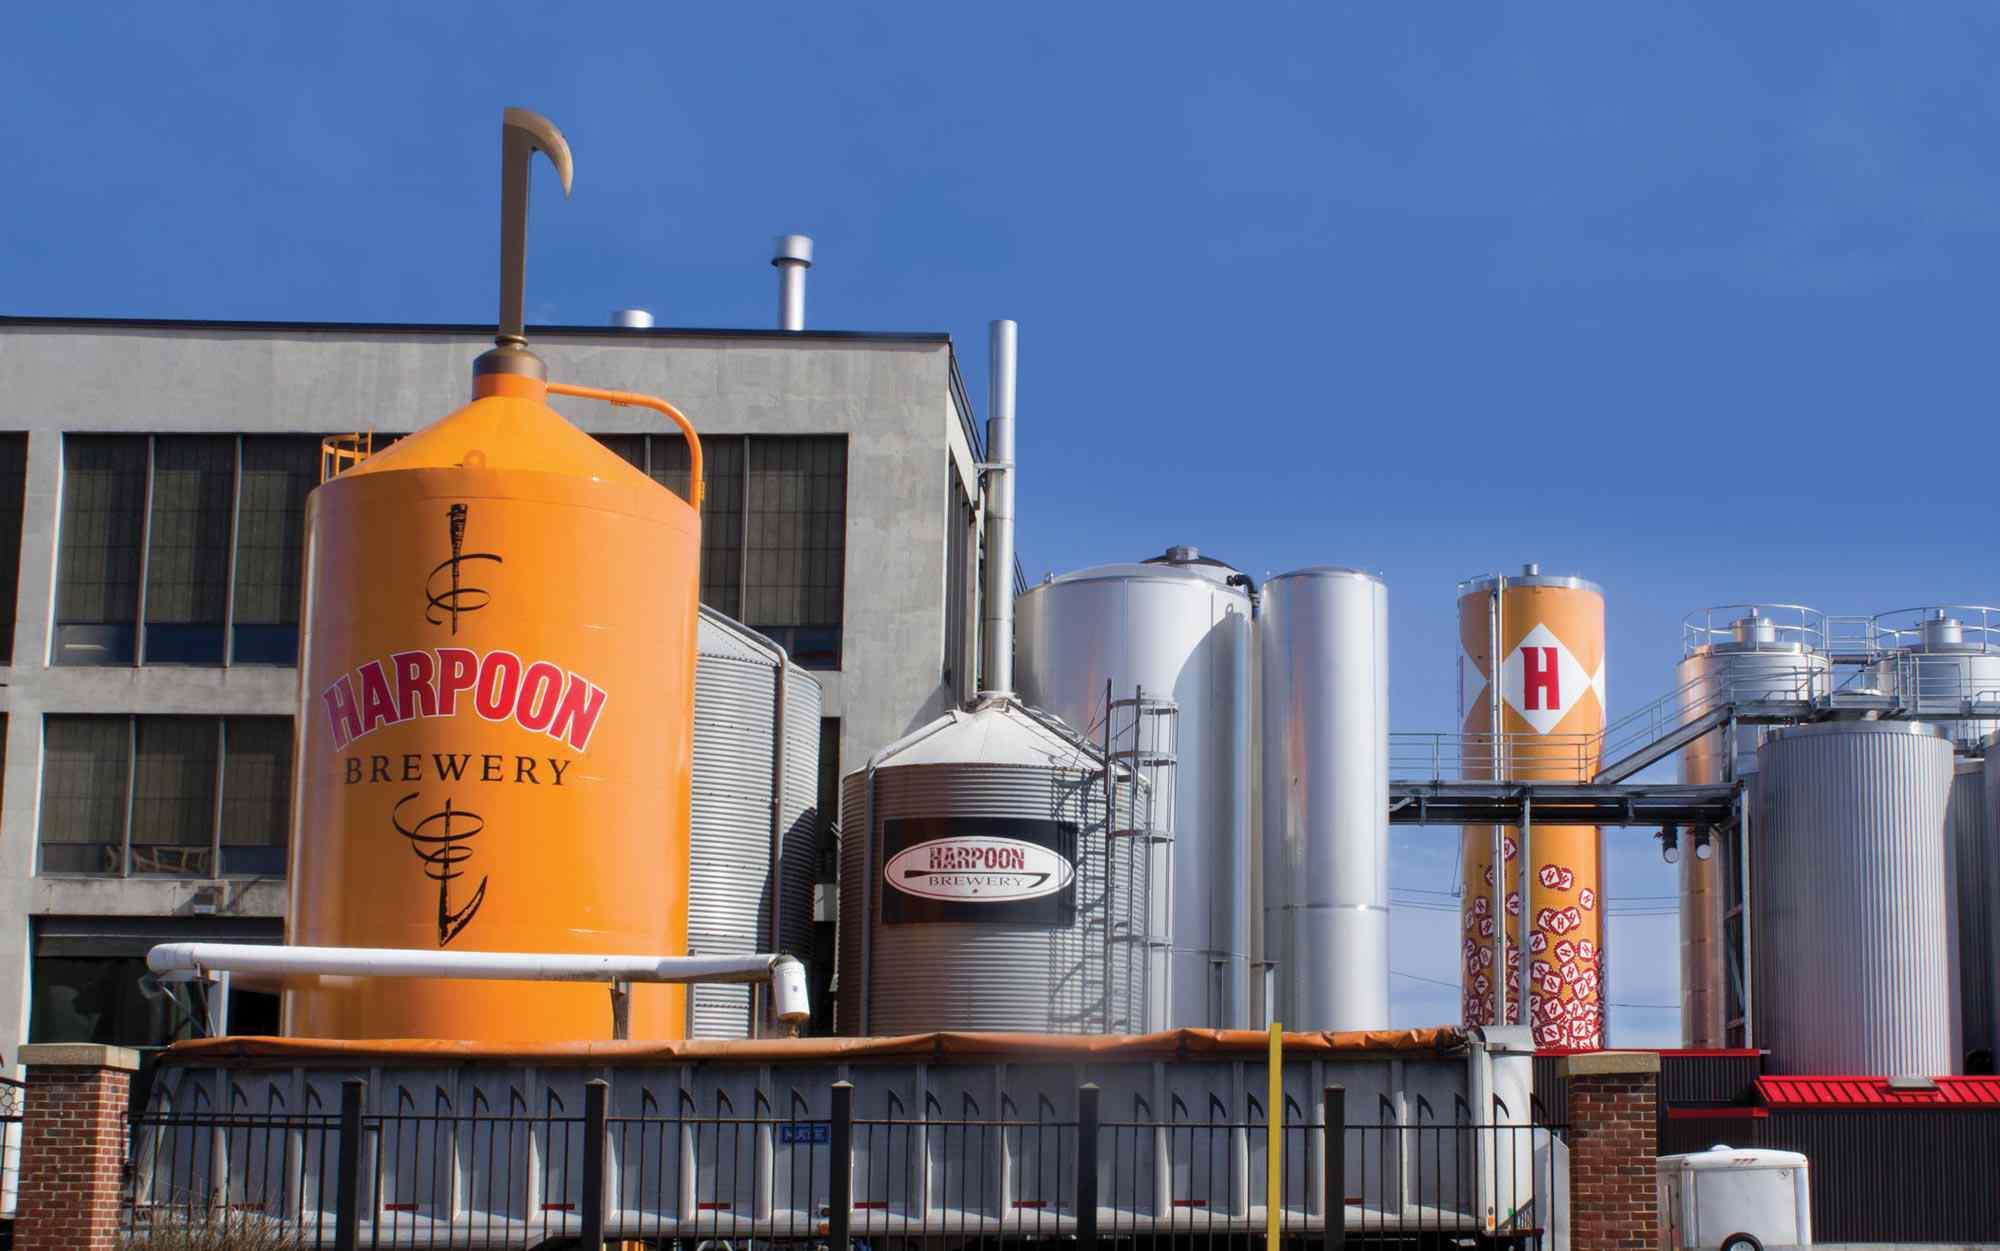 steel barrels on top of Harpoon Brewery in Boston